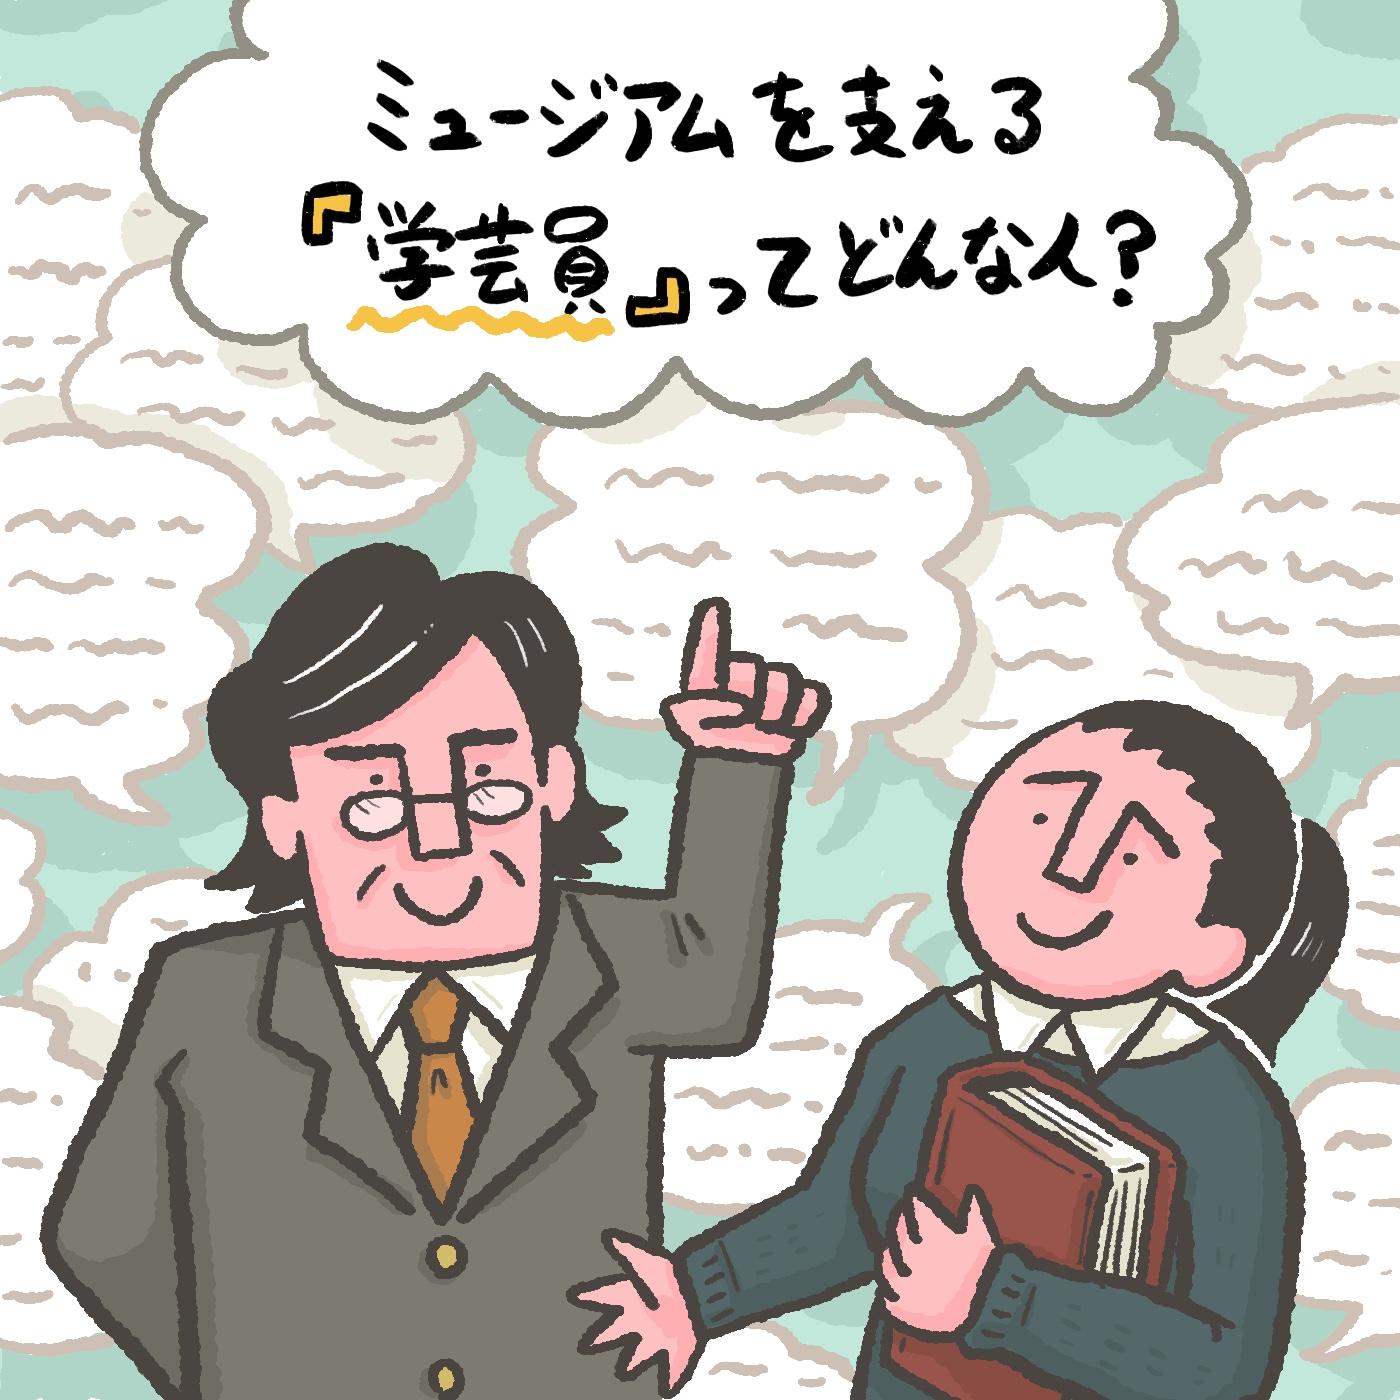 OBIKAKE ナニソレ 学芸員